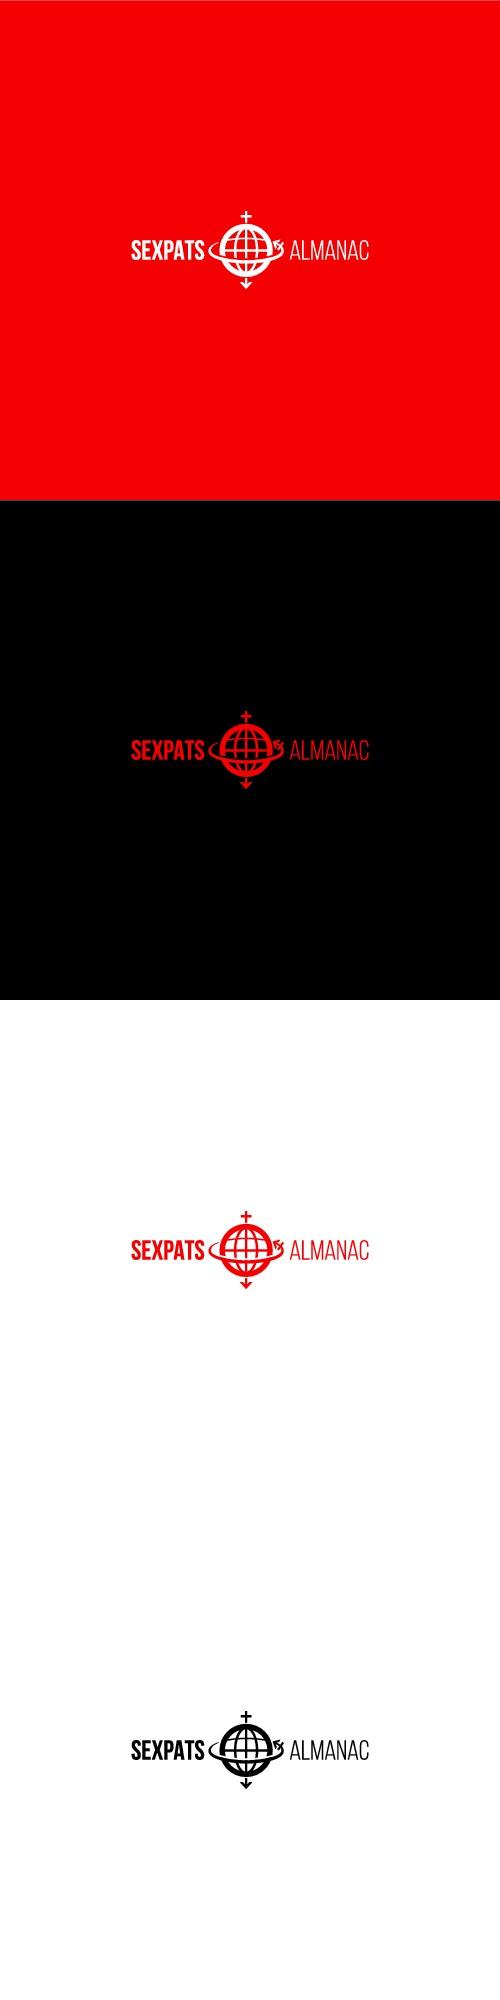 Sexpats Almanac Logo Design